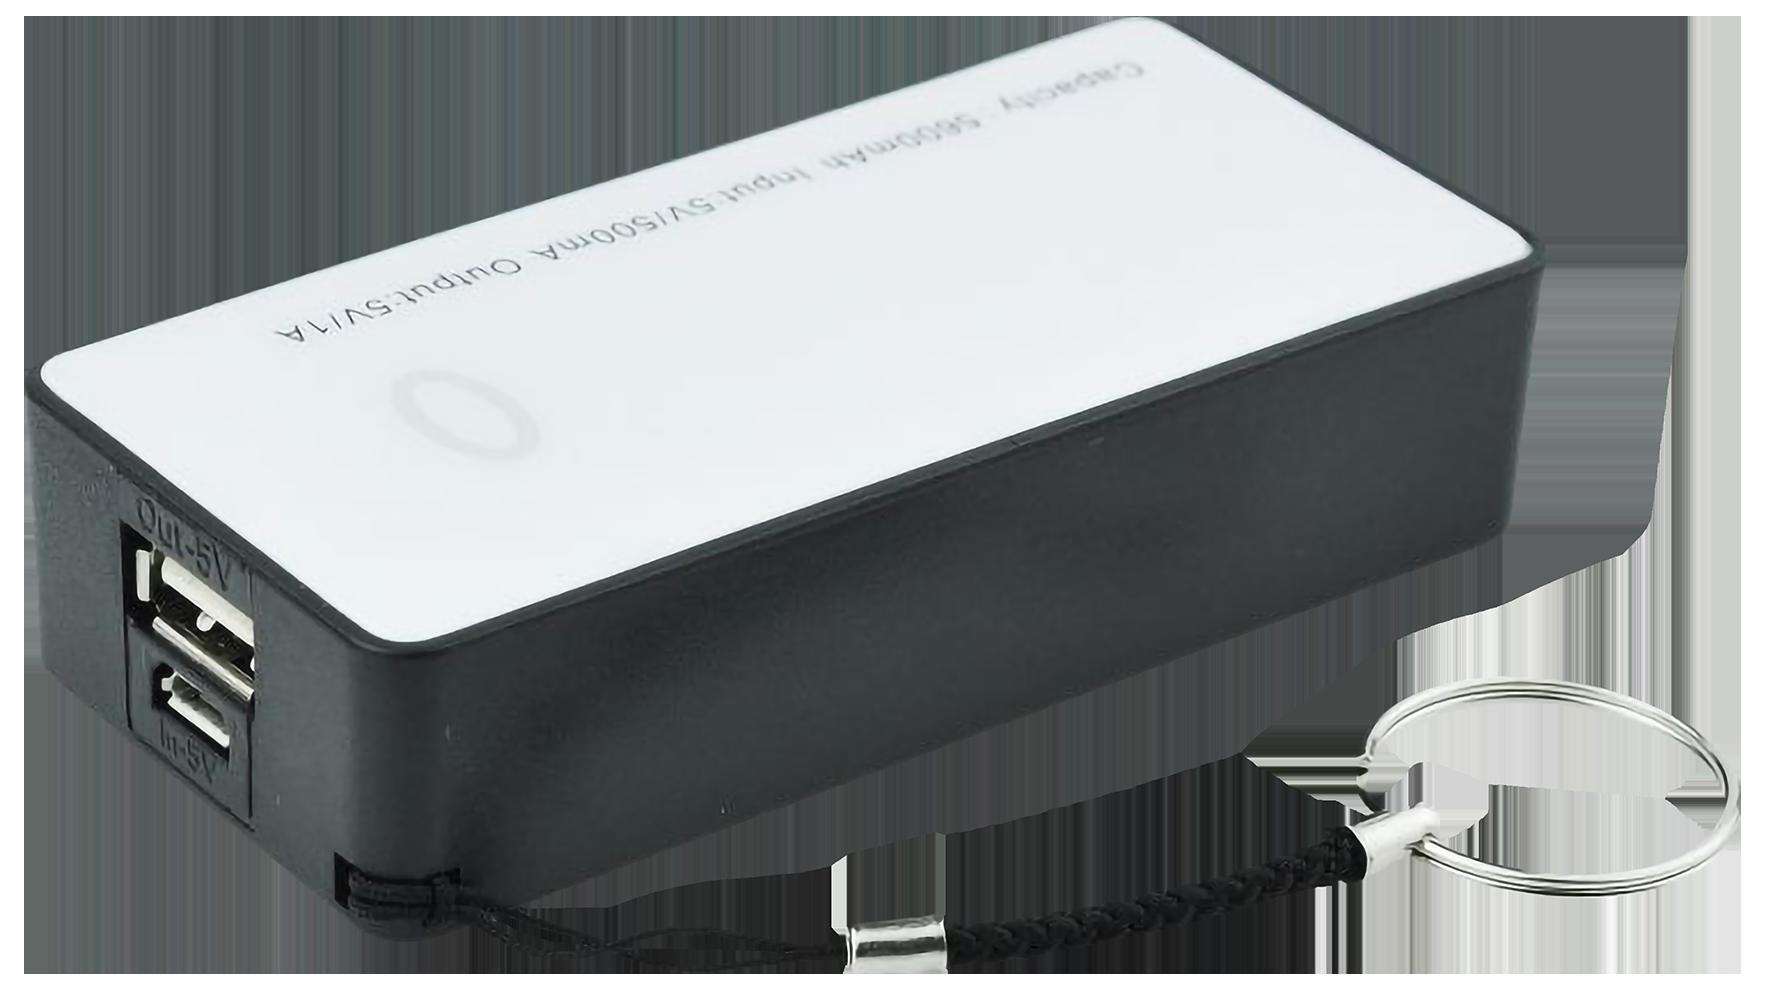 Xiaomi Redmi Note 9T power bank - külső akkumulátor BLUN ST-508 fekete